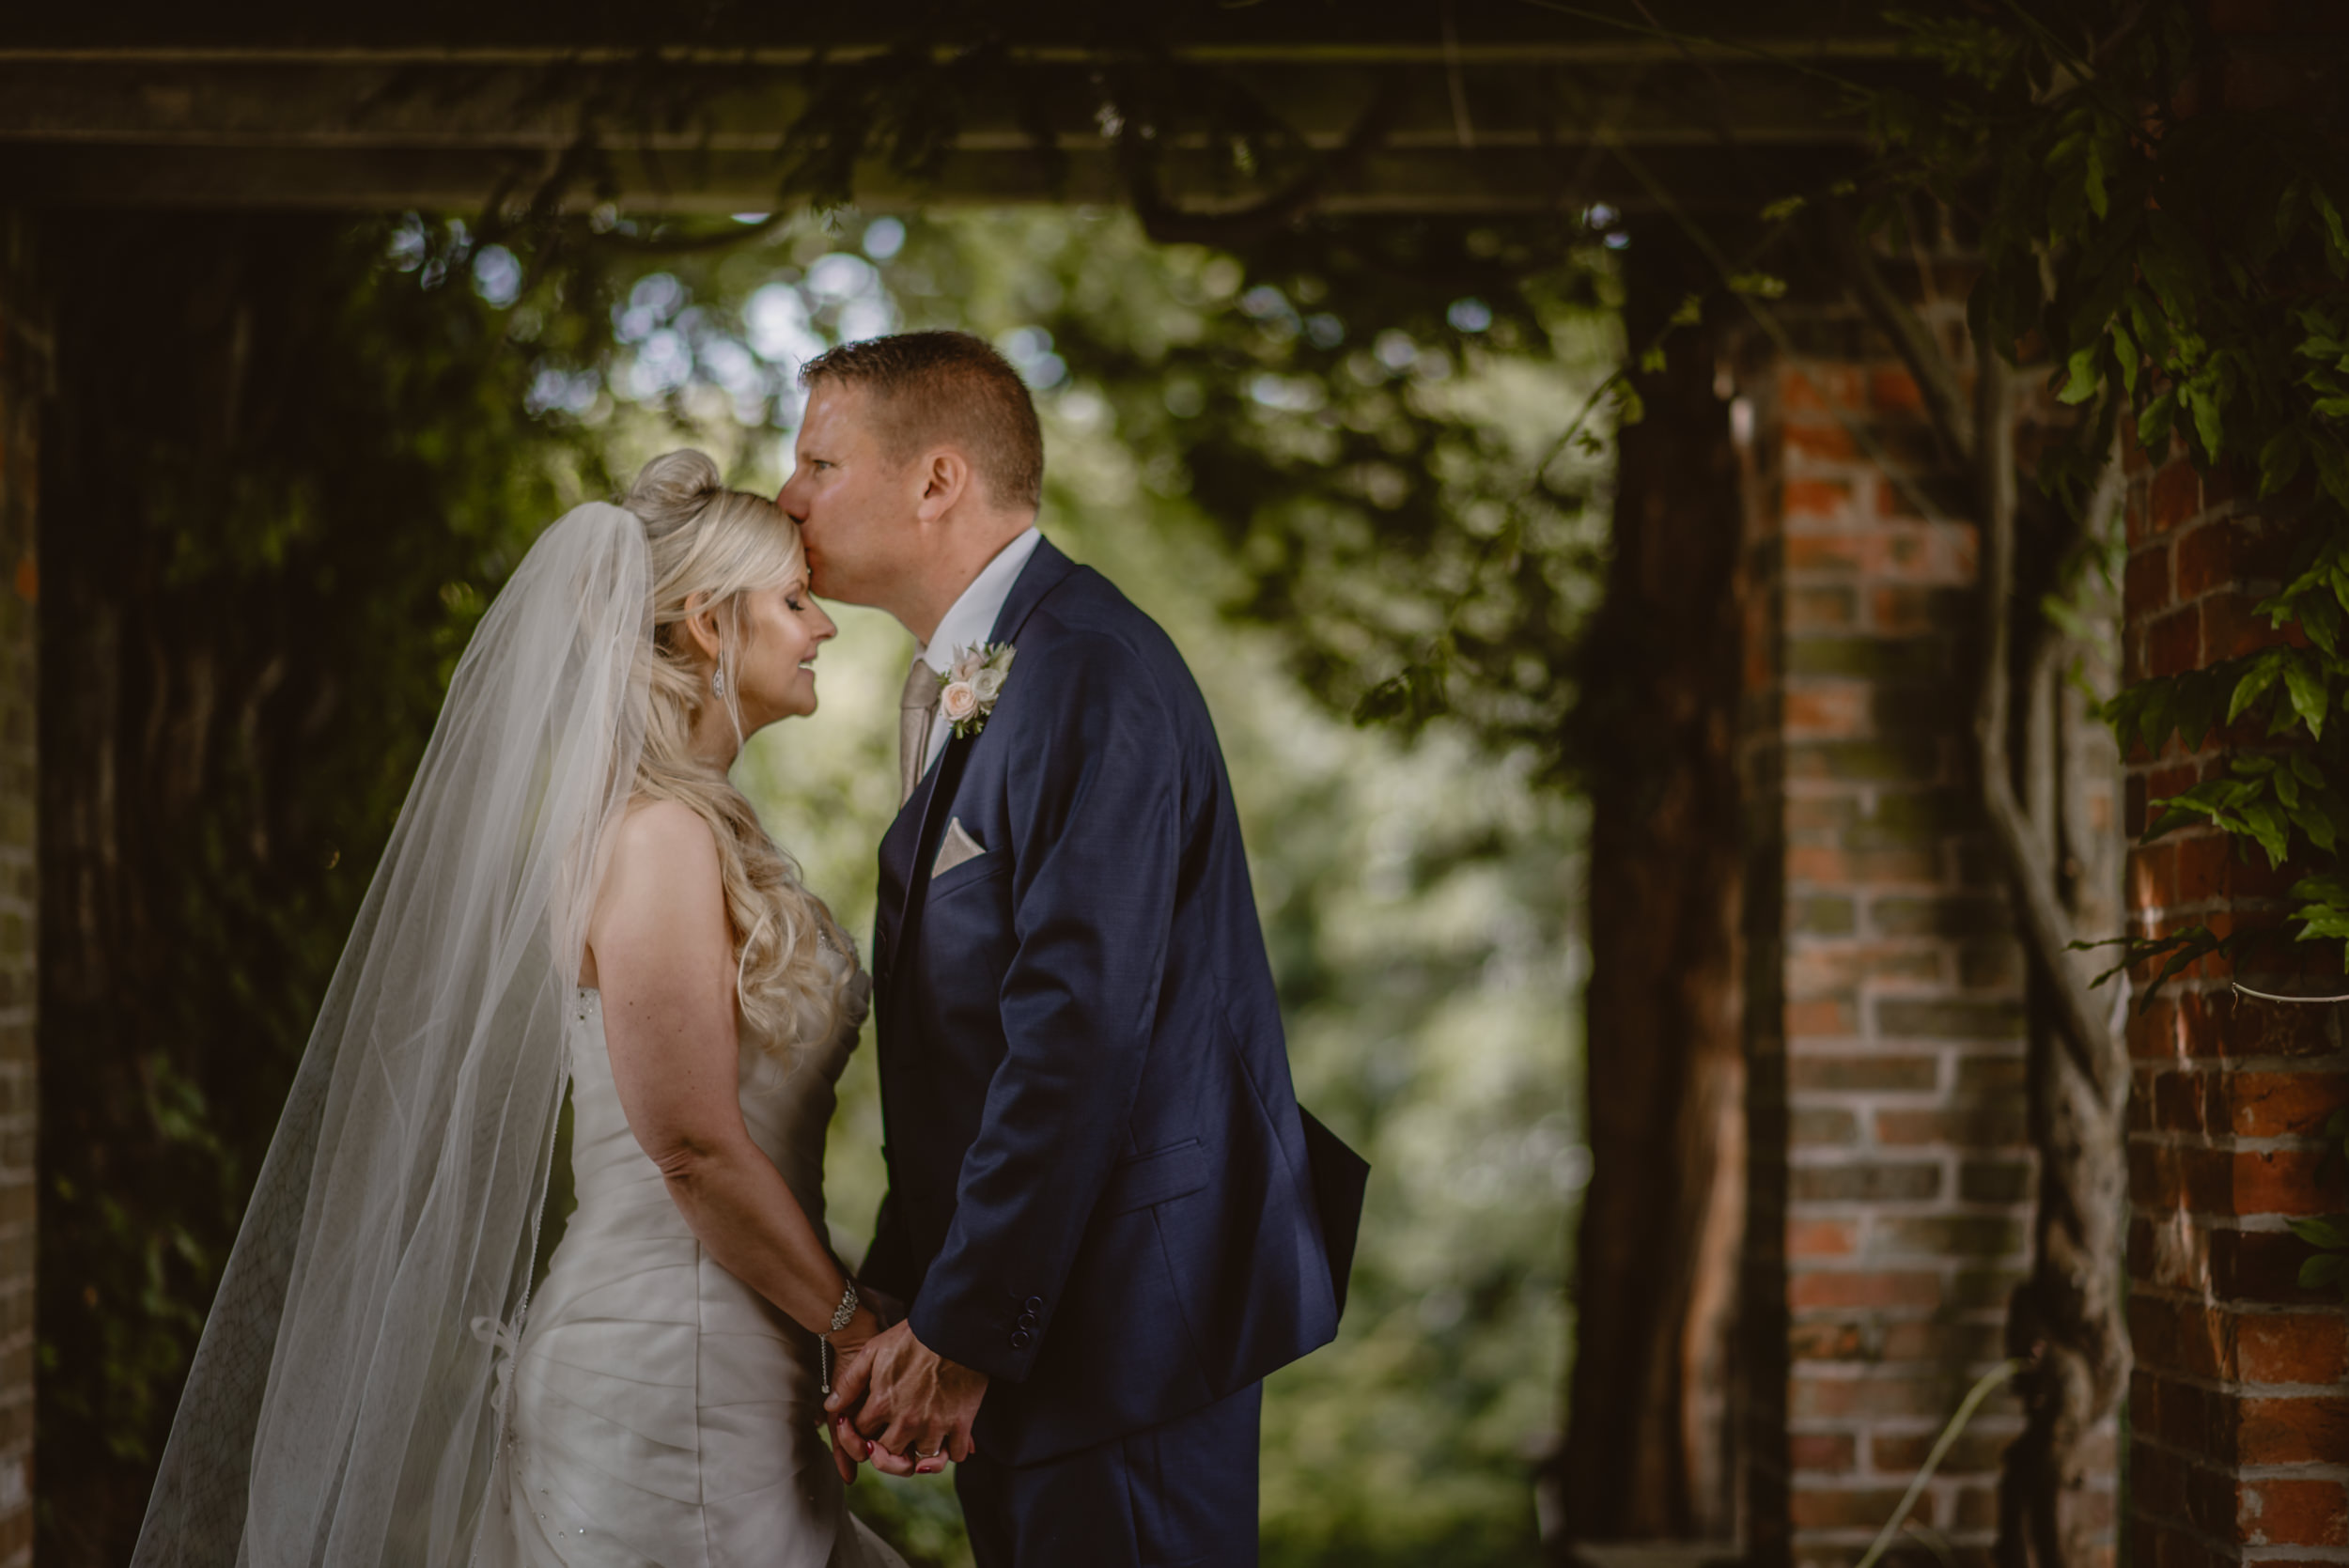 Trisha-and-Roger-wedding-The-Priory-Church-and-Chewton-Glen-Hotel-Christchurch-Manu-Mendoza-Wedding-Photography-321.jpg